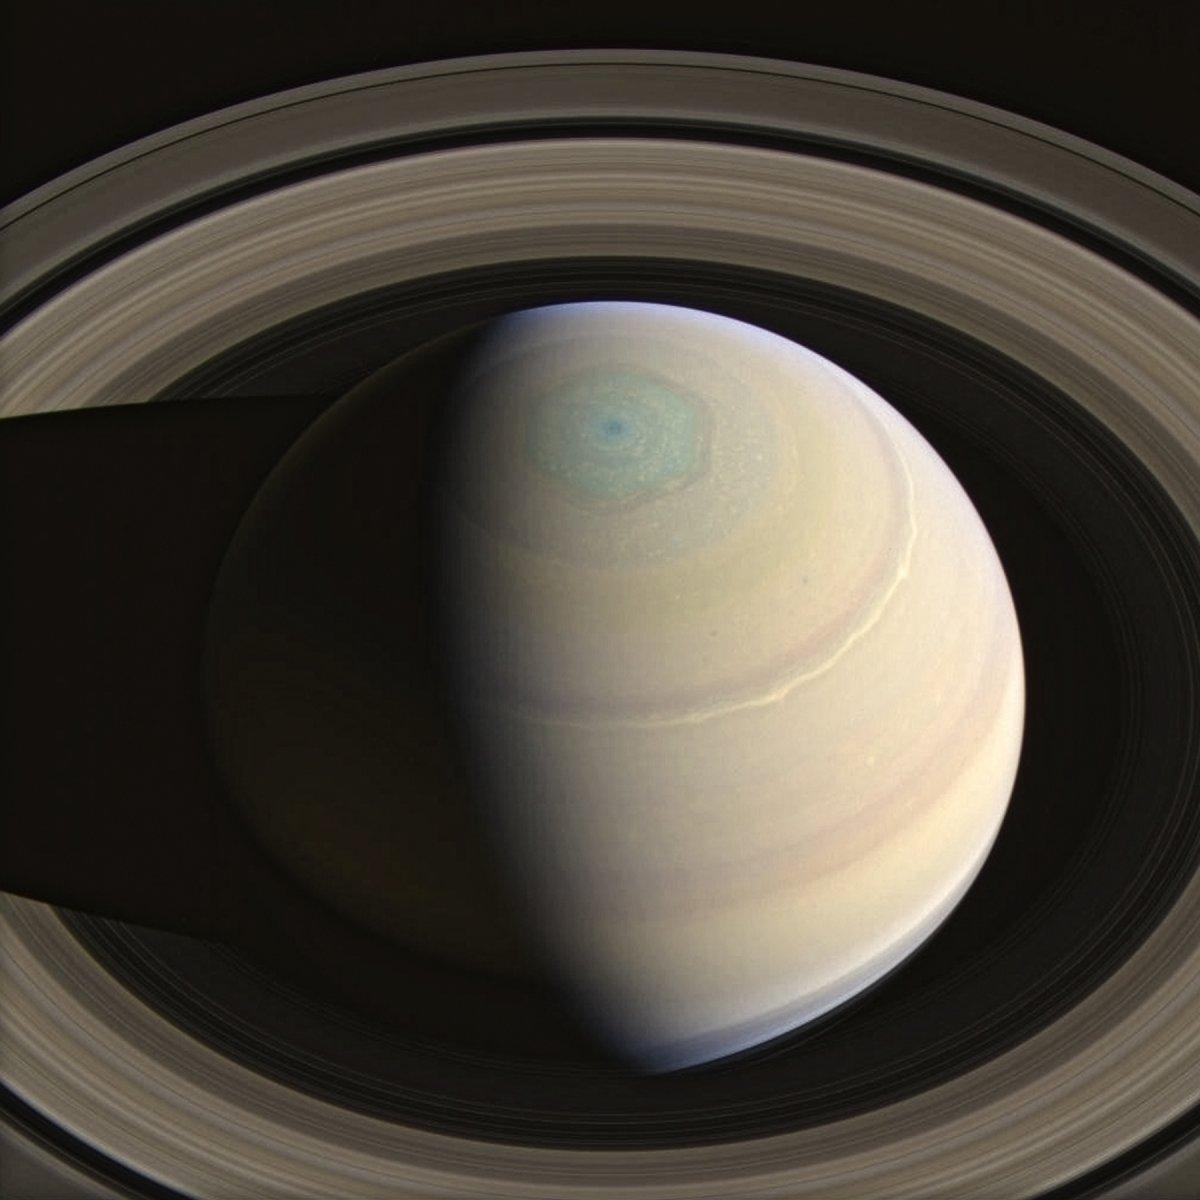 imagenes nunca vistas de saturno tomadas por la sonda cassini 3